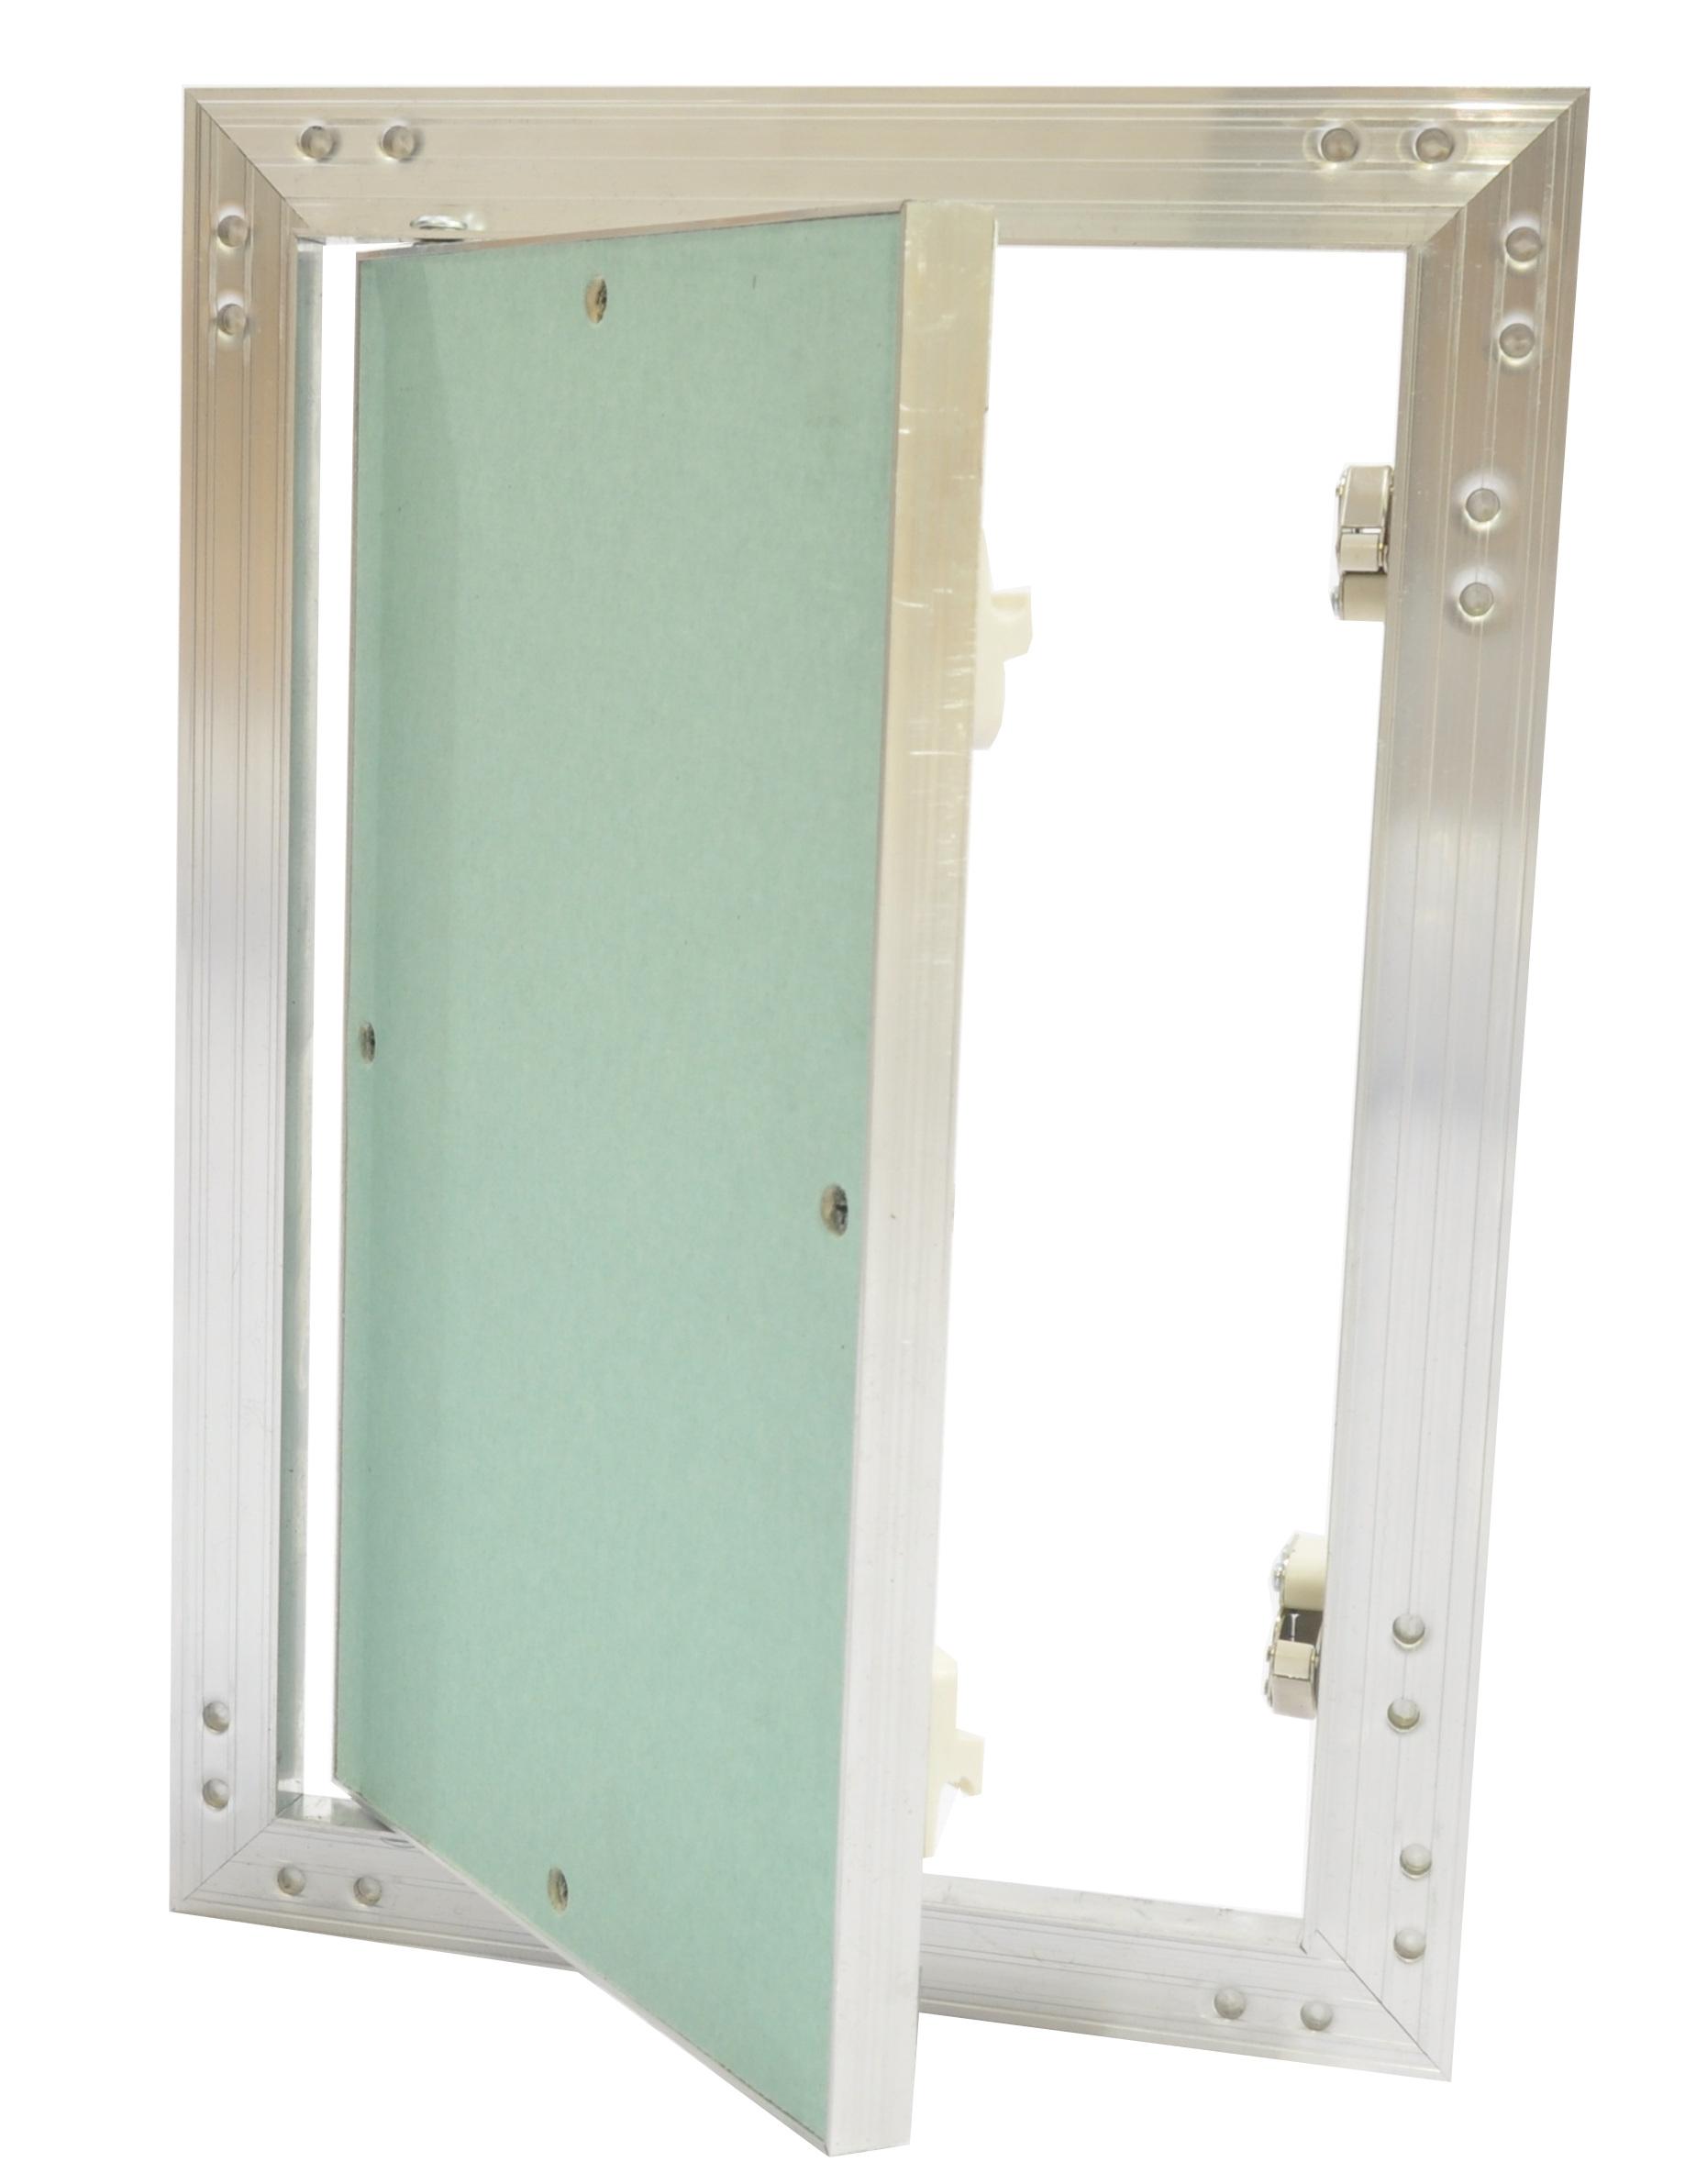 revisionsklappe viele gr en aluminium rahmen 12 5 mm t r gk einlage gipskarton ebay. Black Bedroom Furniture Sets. Home Design Ideas